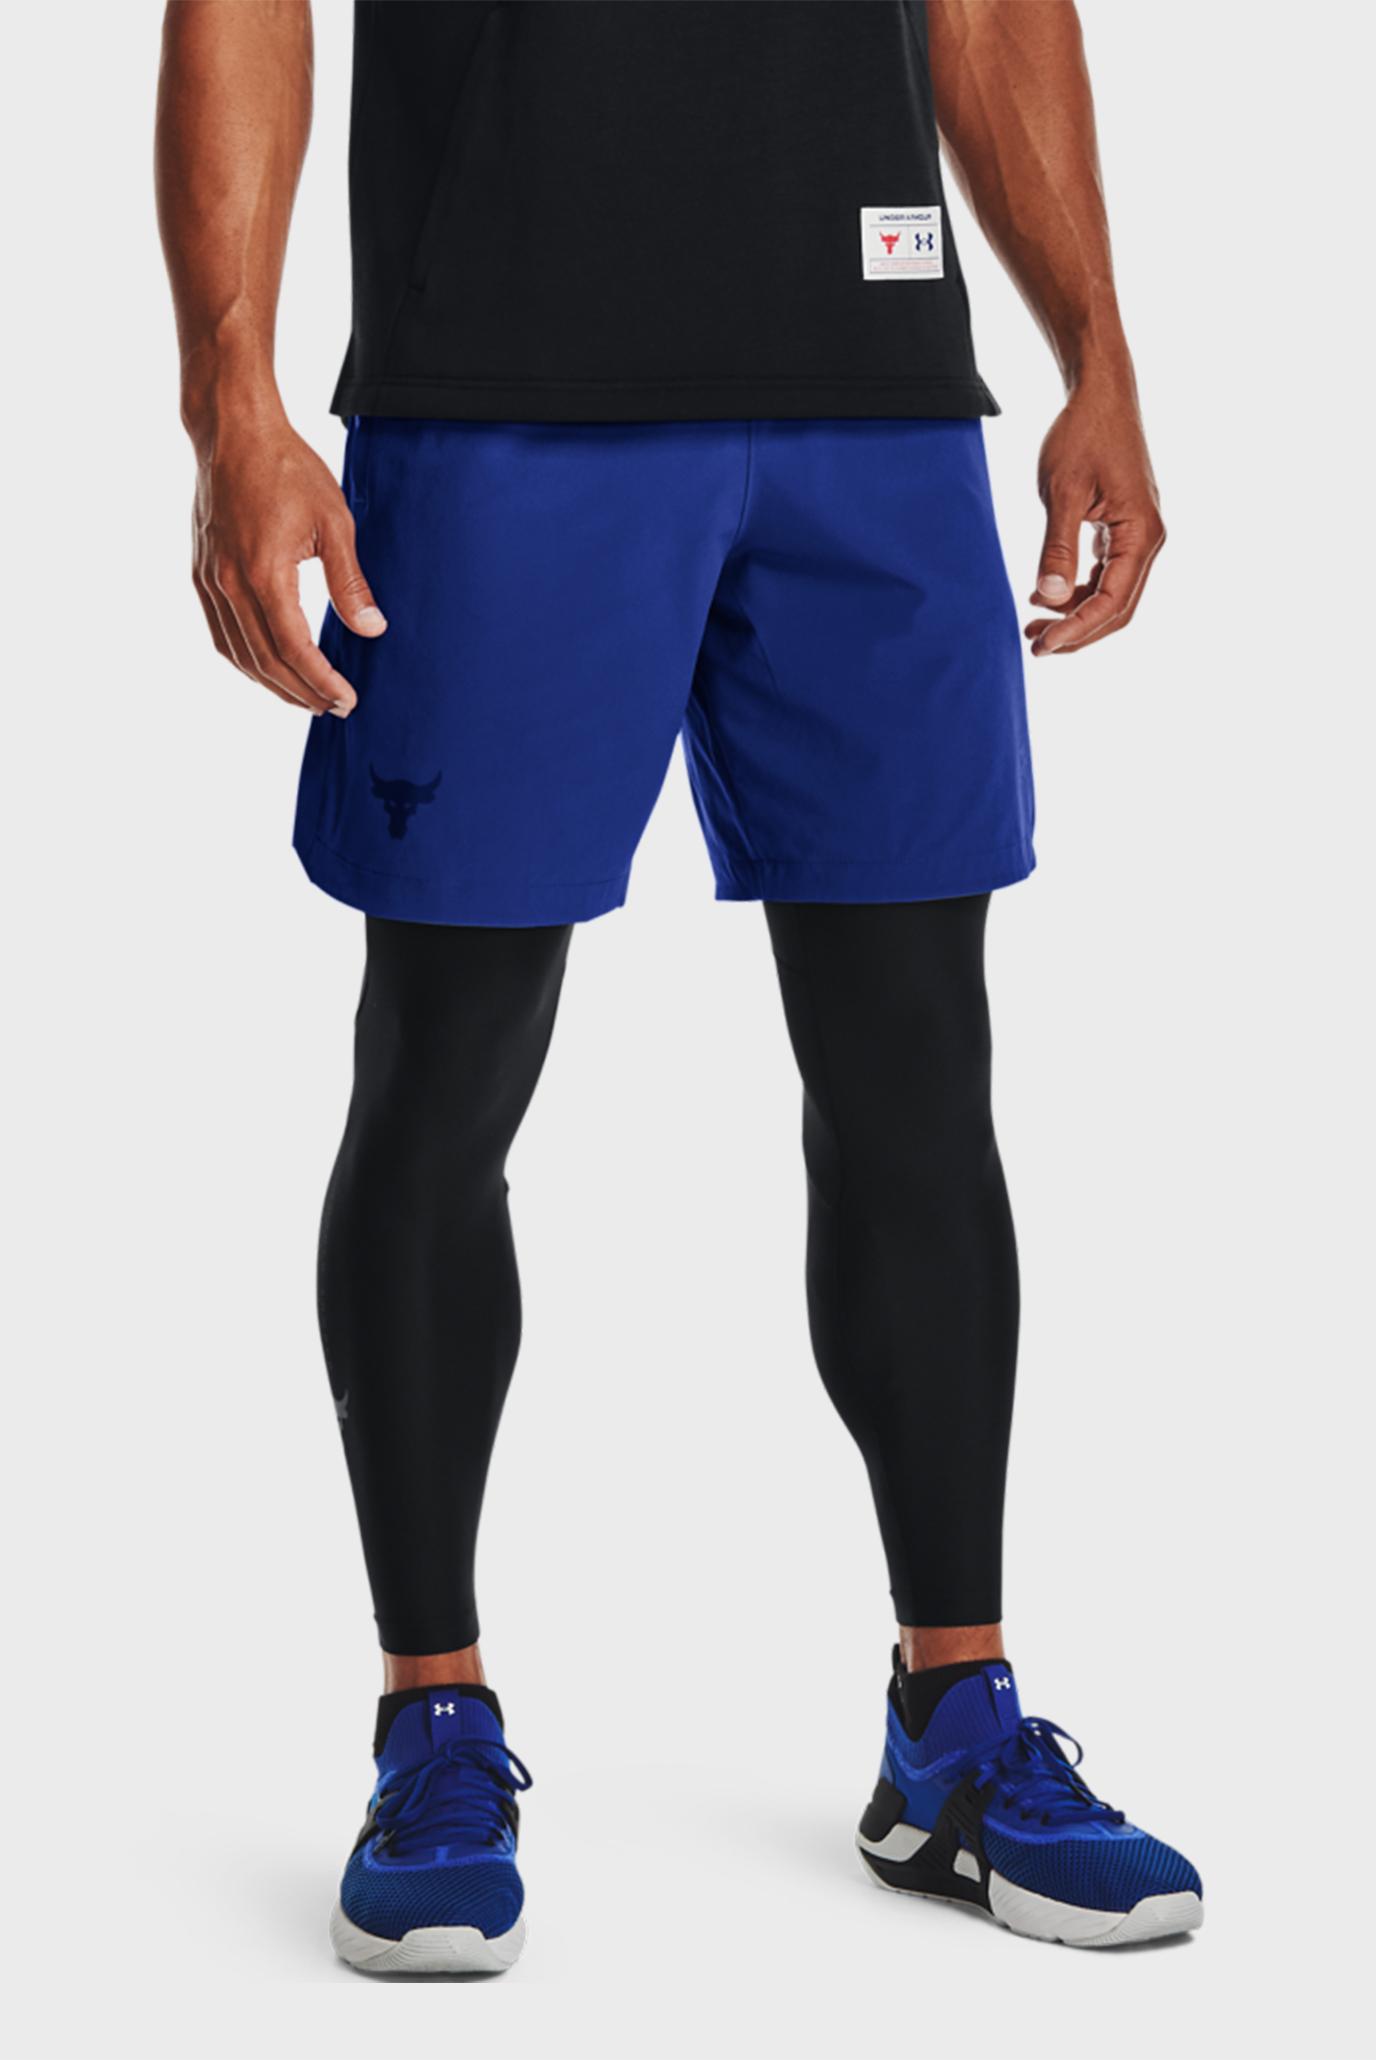 Мужские синие шорты UA Pjt Rck Snap Shorts 1